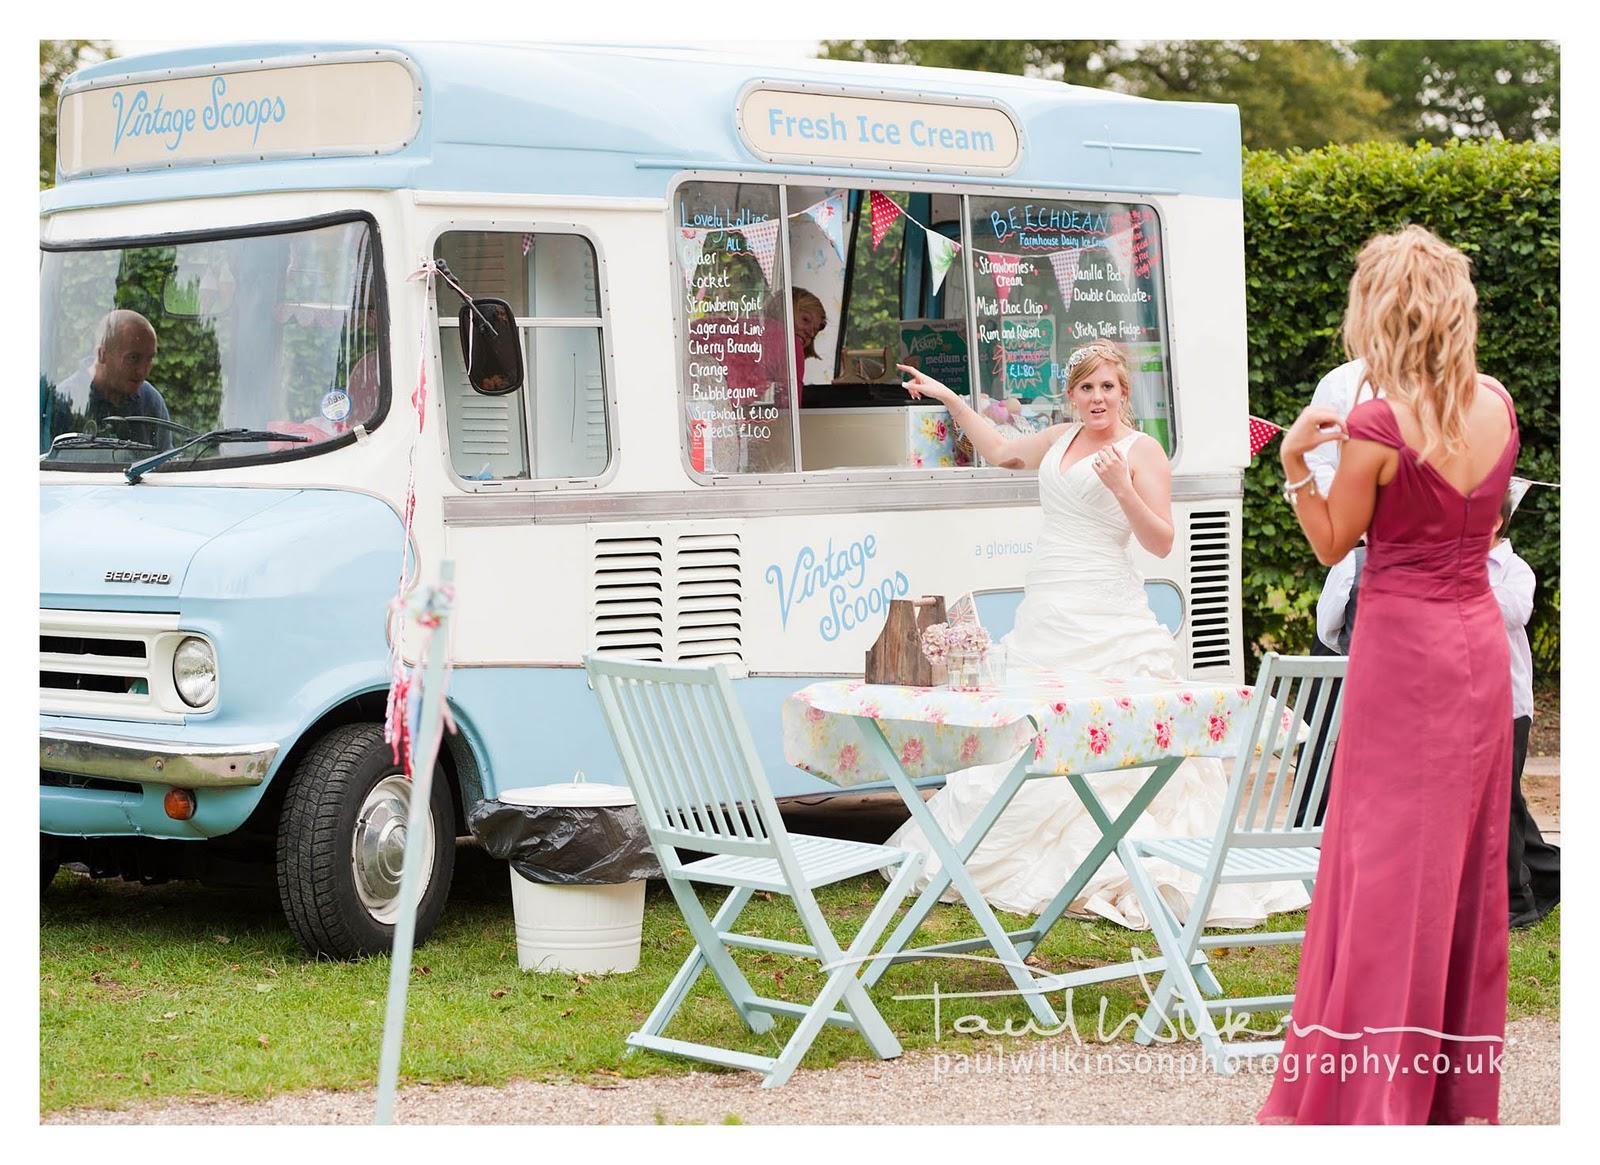 Vintage Scoops Is The Brainchild Of Mrs Who Owns Bettty Very Cool Retro Ice Cream Van